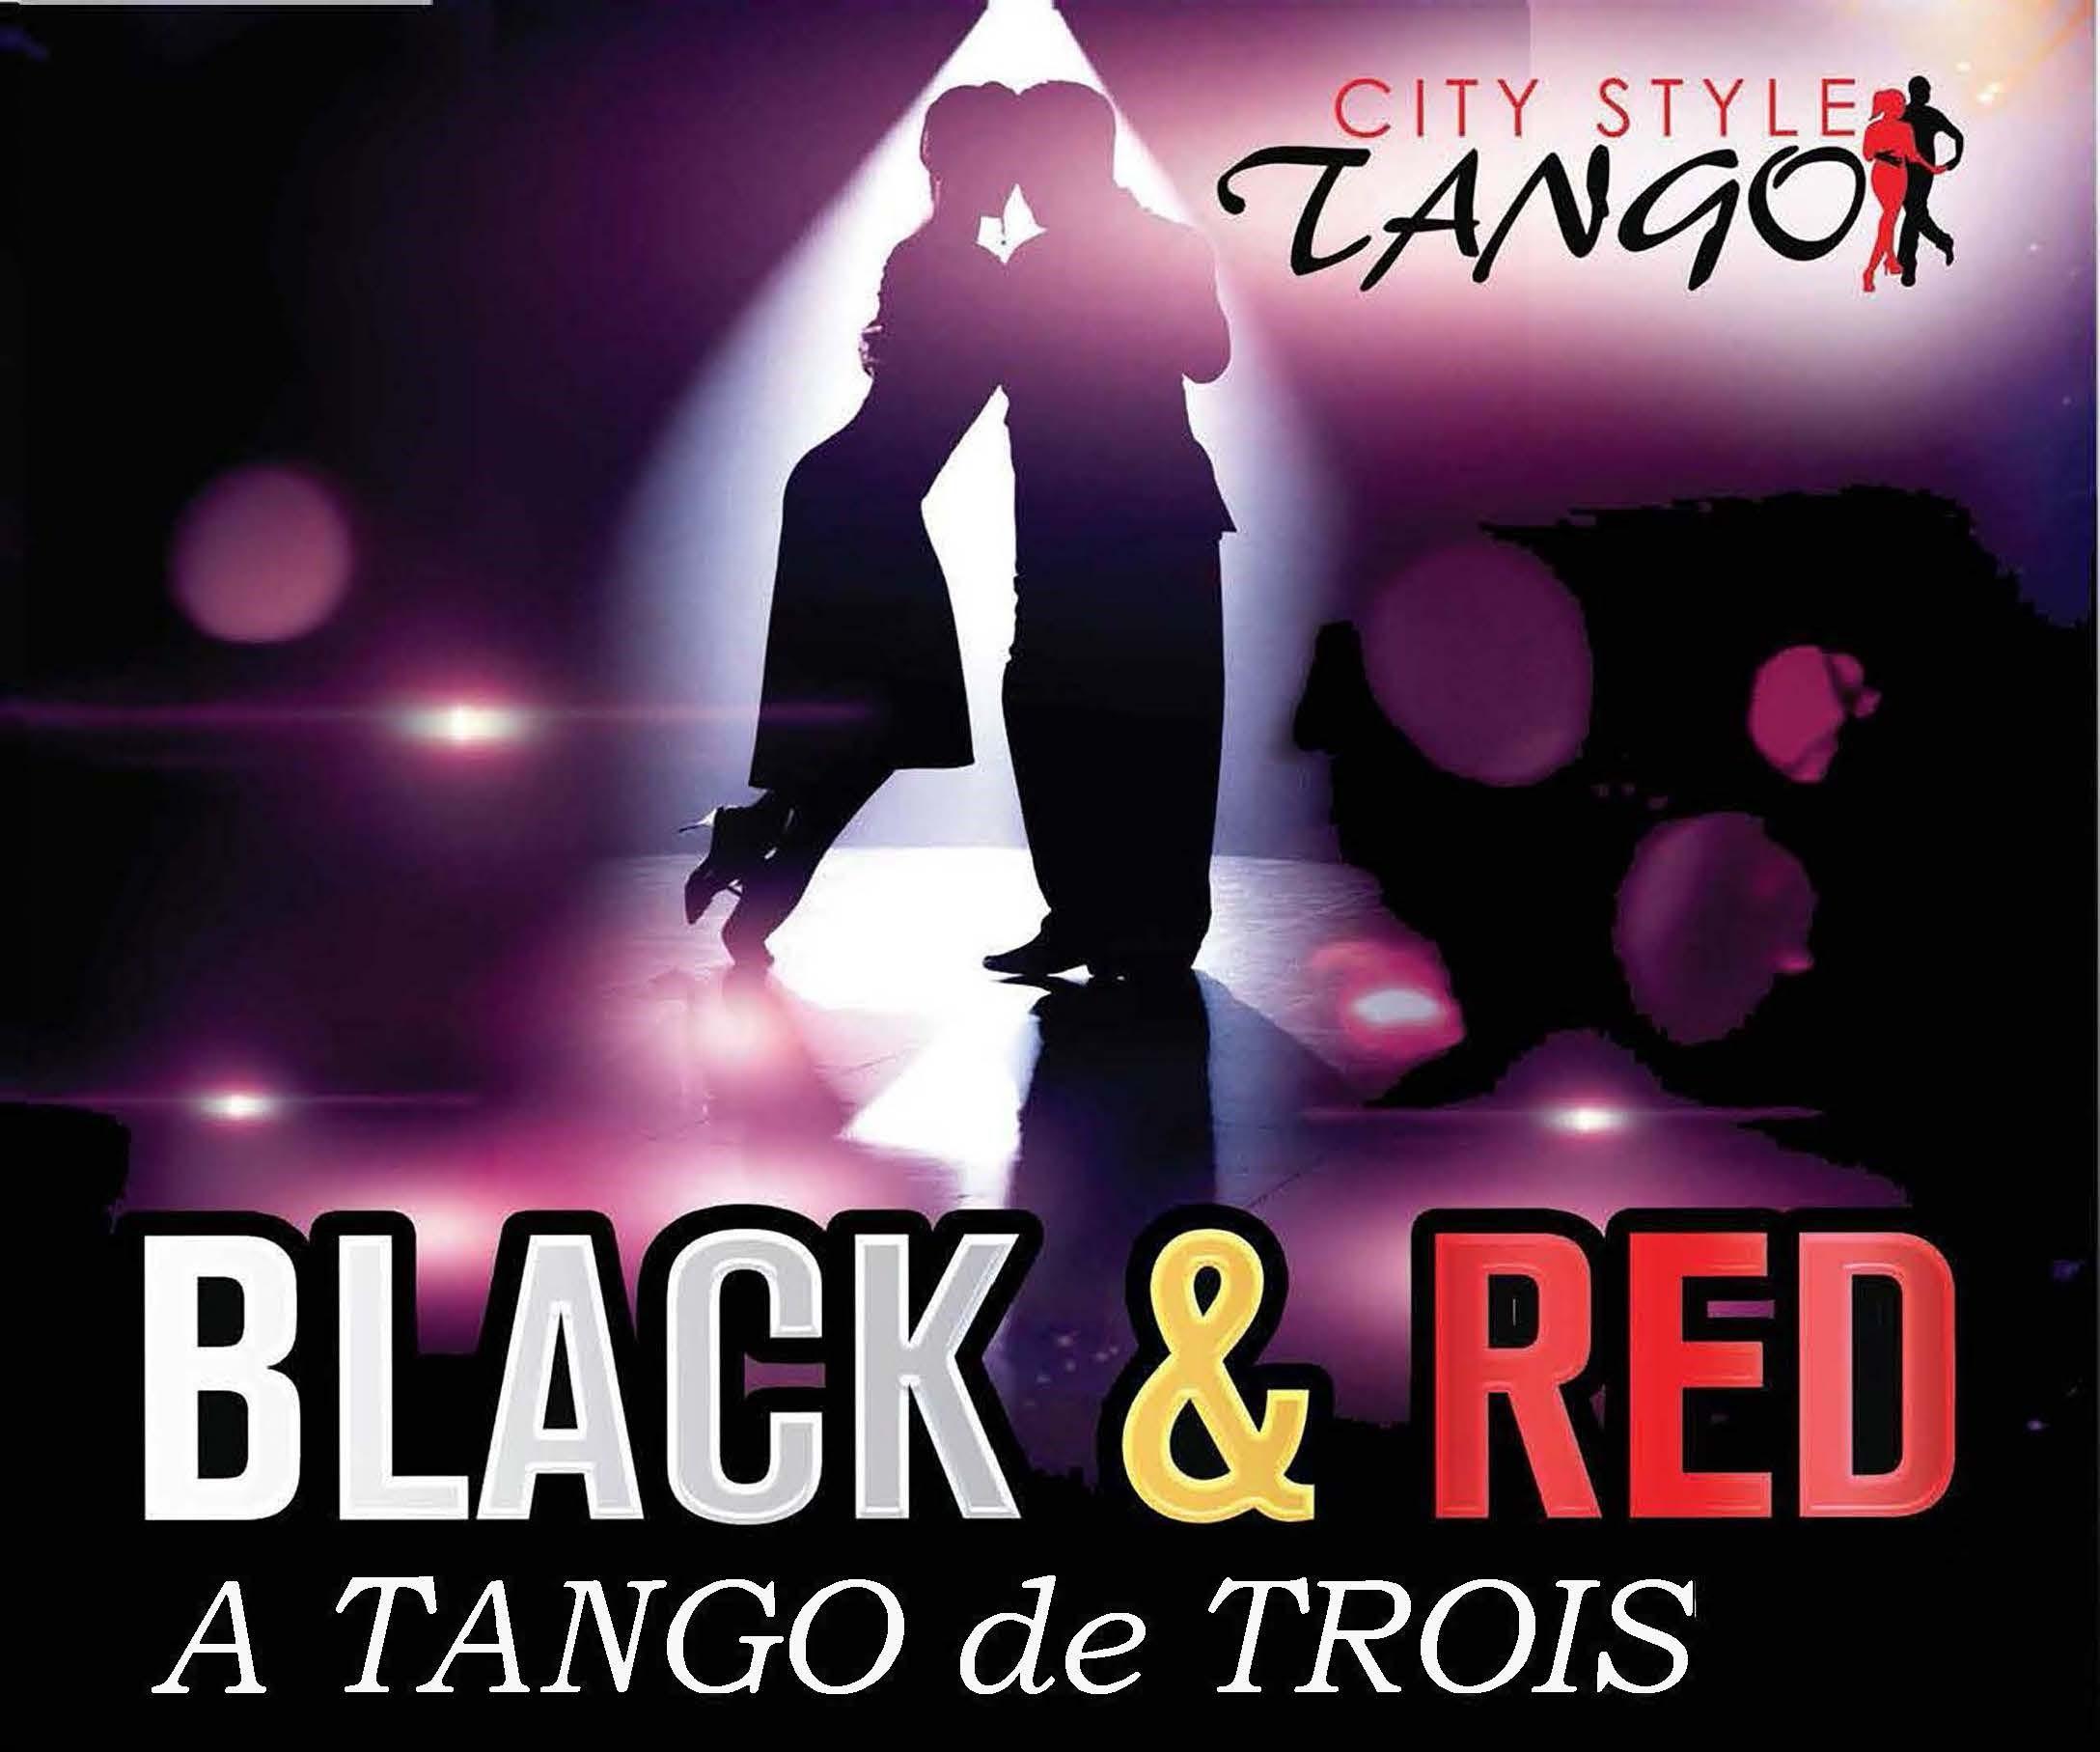 Black & Red: A Tango de Trois